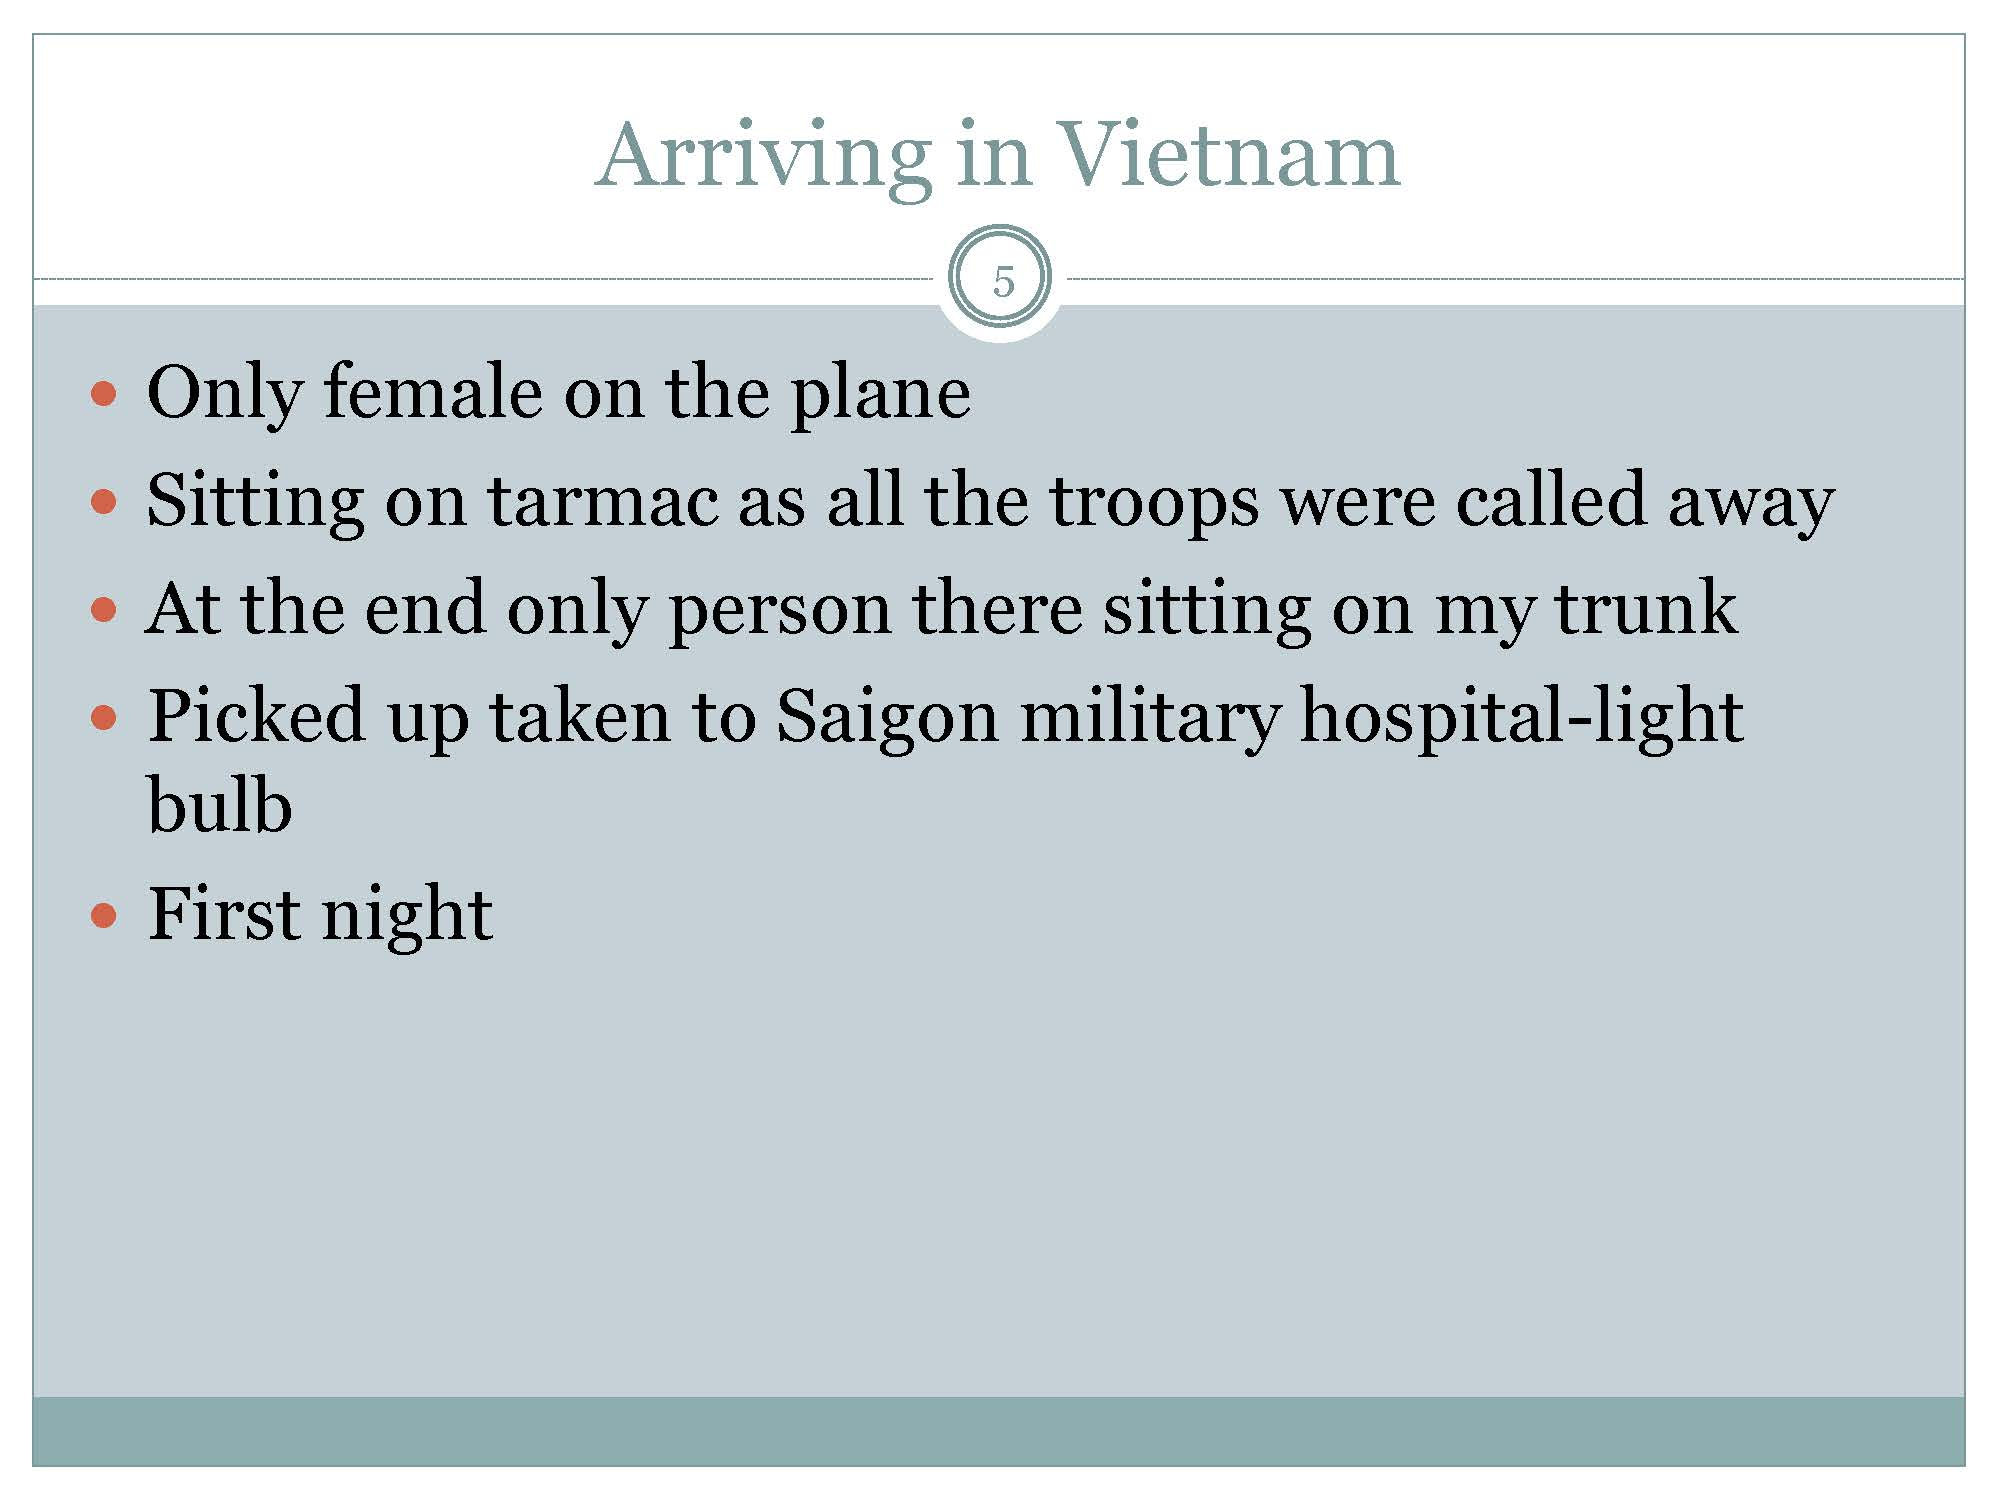 Vietnam 05.jpg